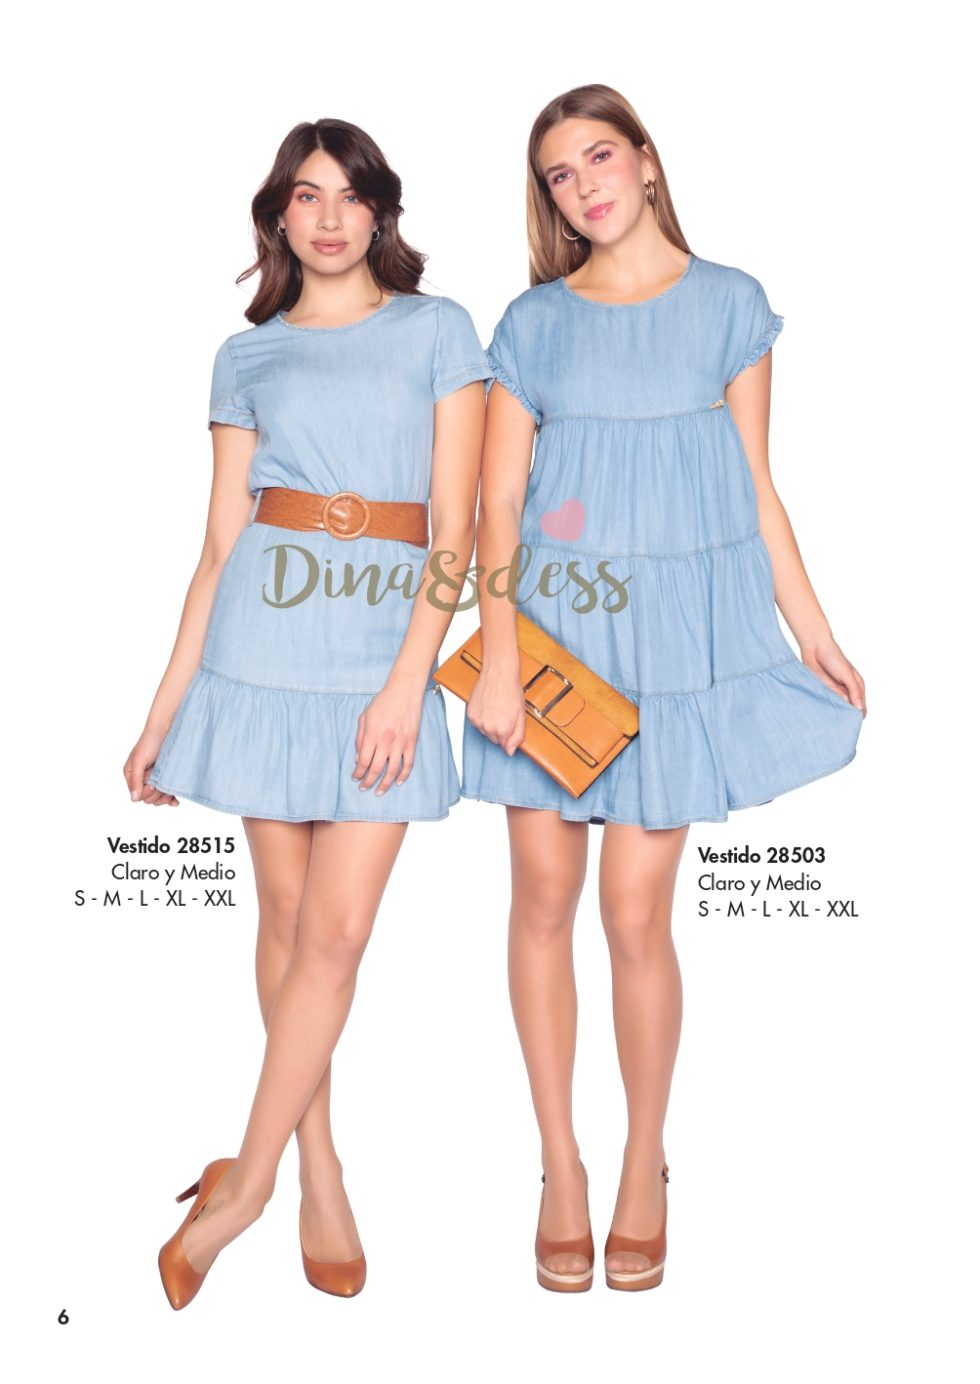 Verano 2021 Dina&Dess Clientes_page-0008